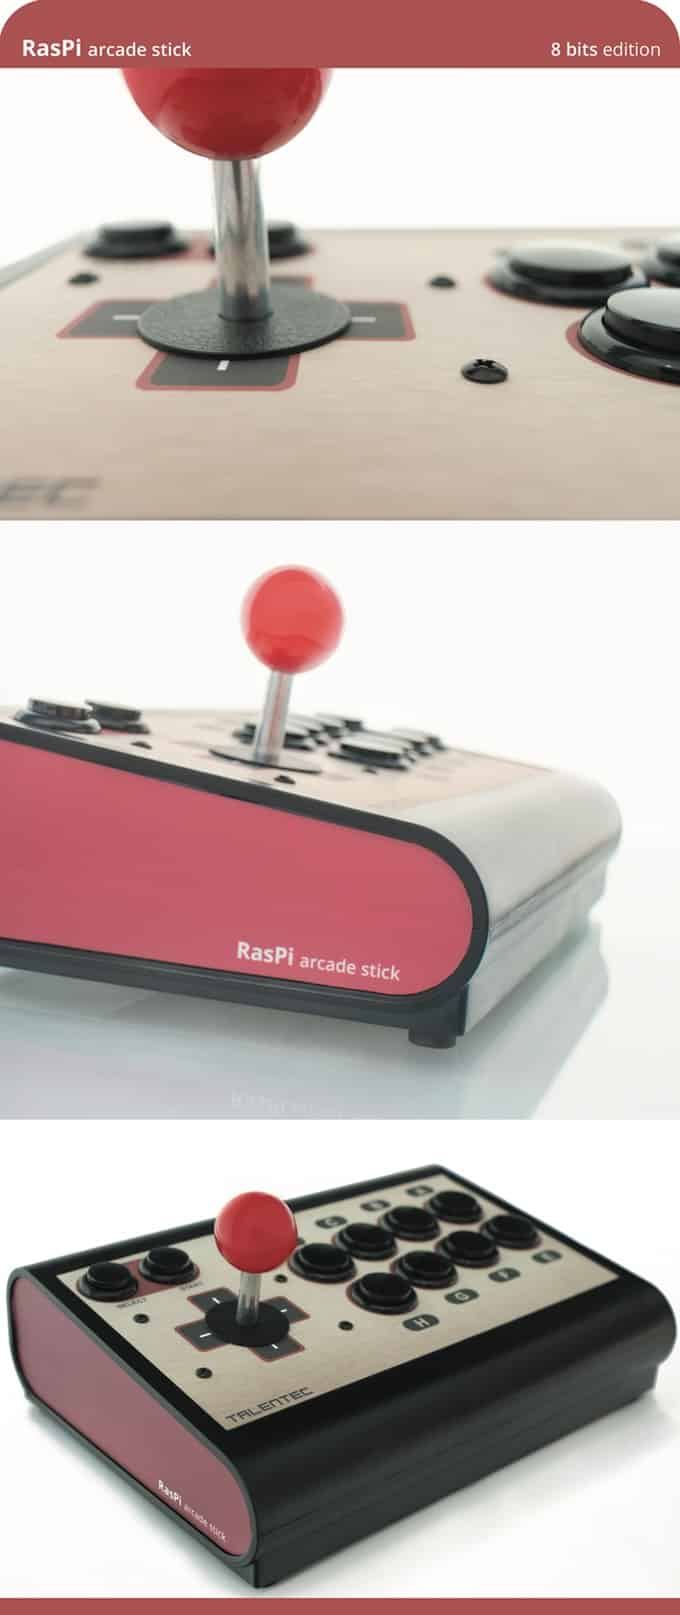 , RasPi arcade stick | El mando arcade personalizable e inteligente, Talentec